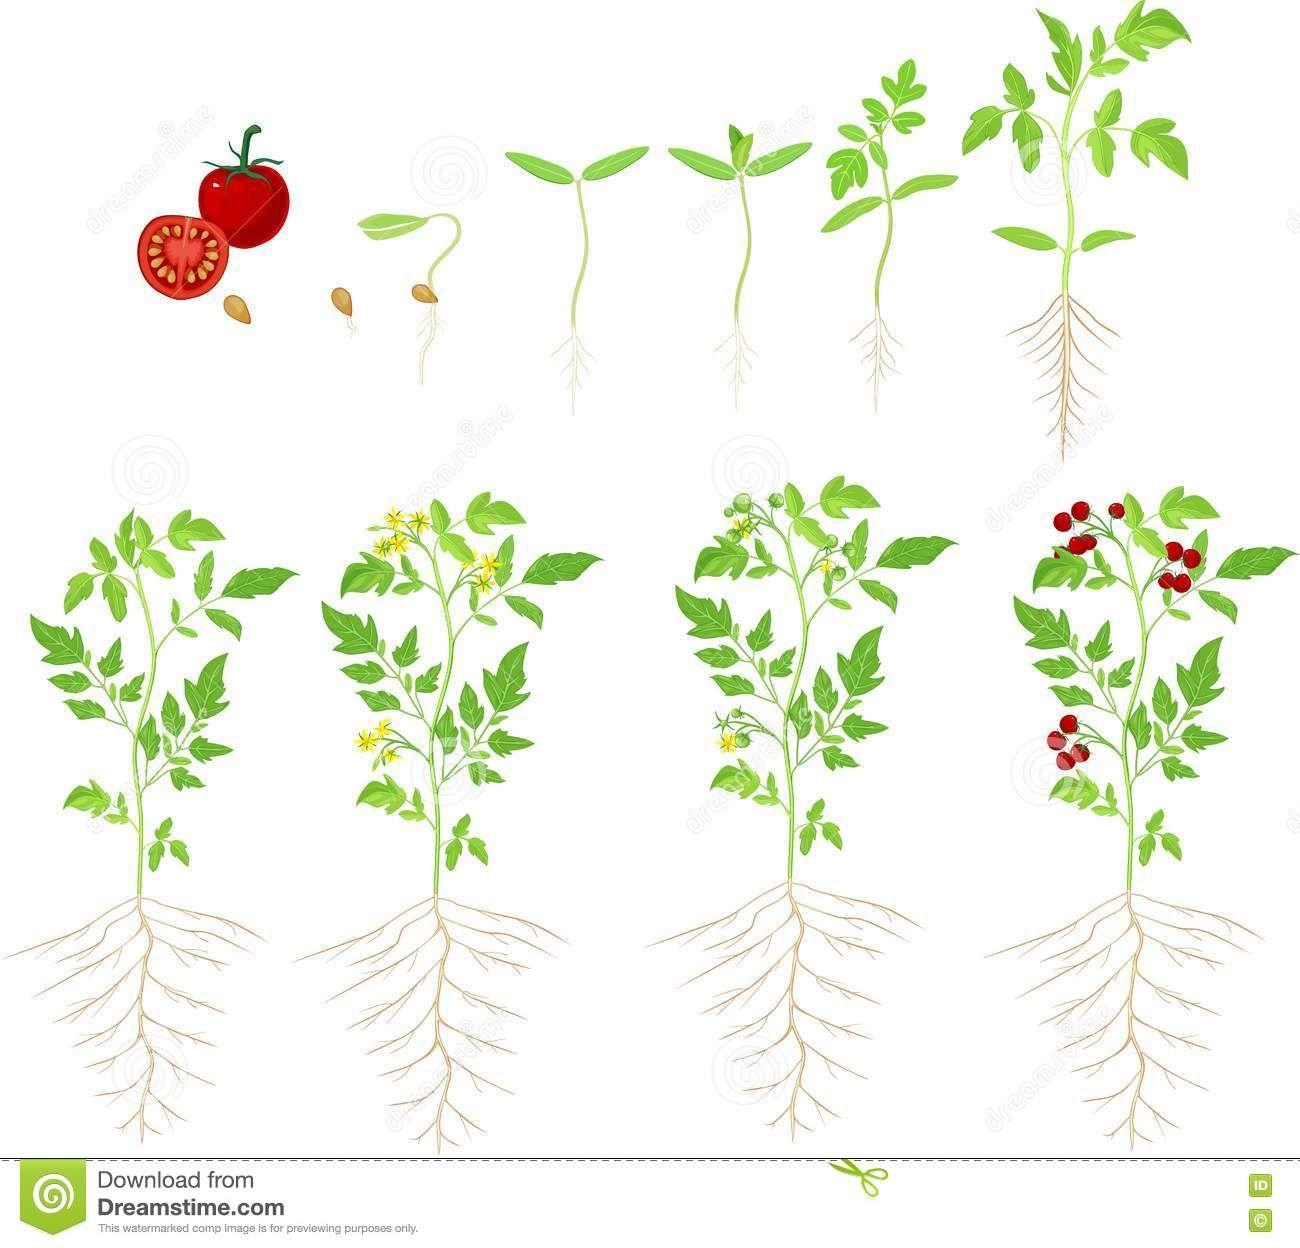 worksheet Stages Of Plant Growth Worksheet cherry tomato growing stage plant 71727898 jpg mpg jpg